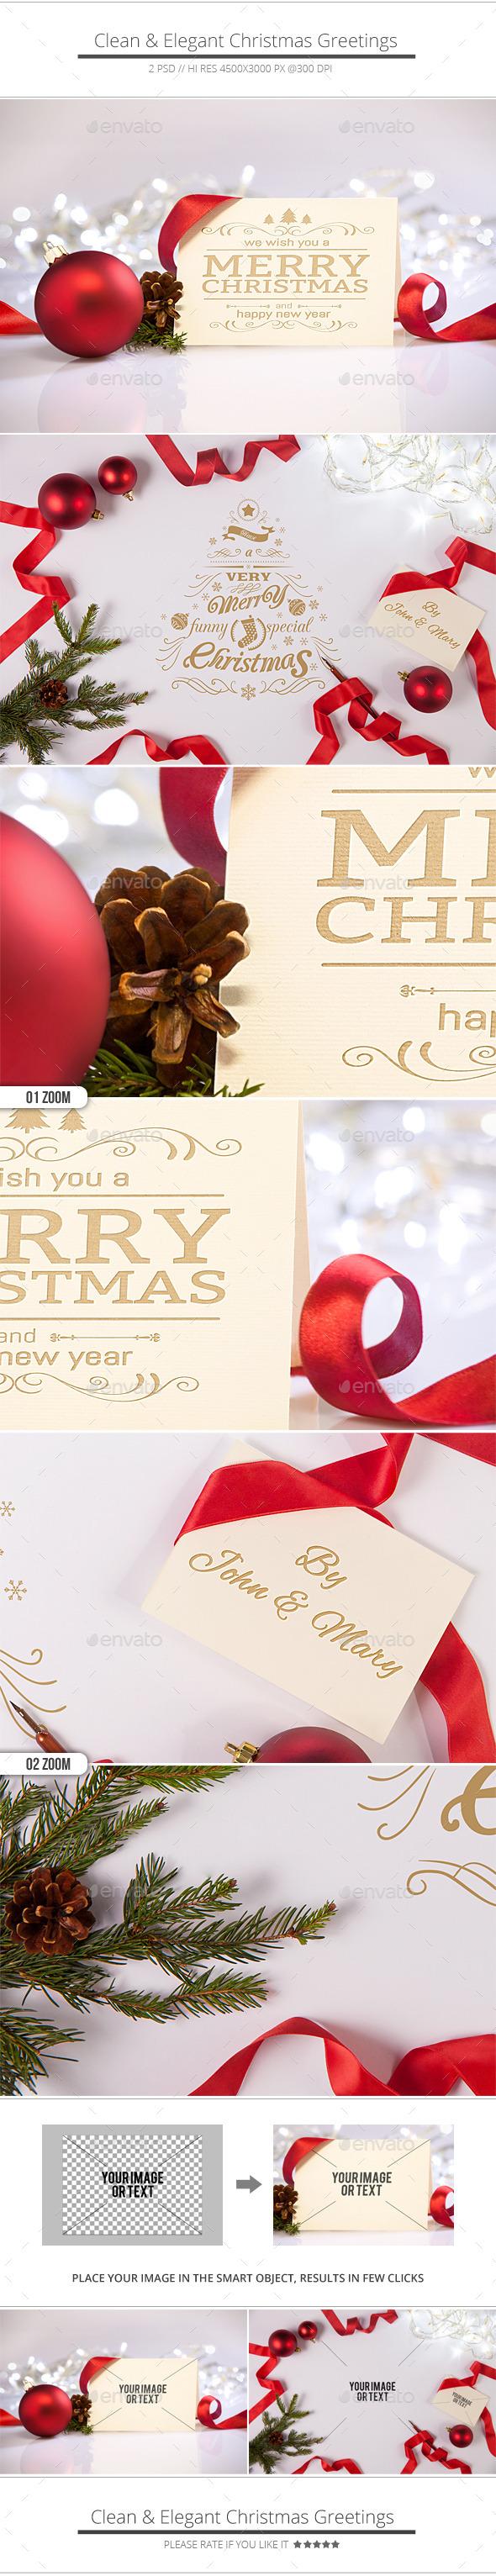 Clean and Elegant Christmas Greetings Mockups - Print Product Mock-Ups